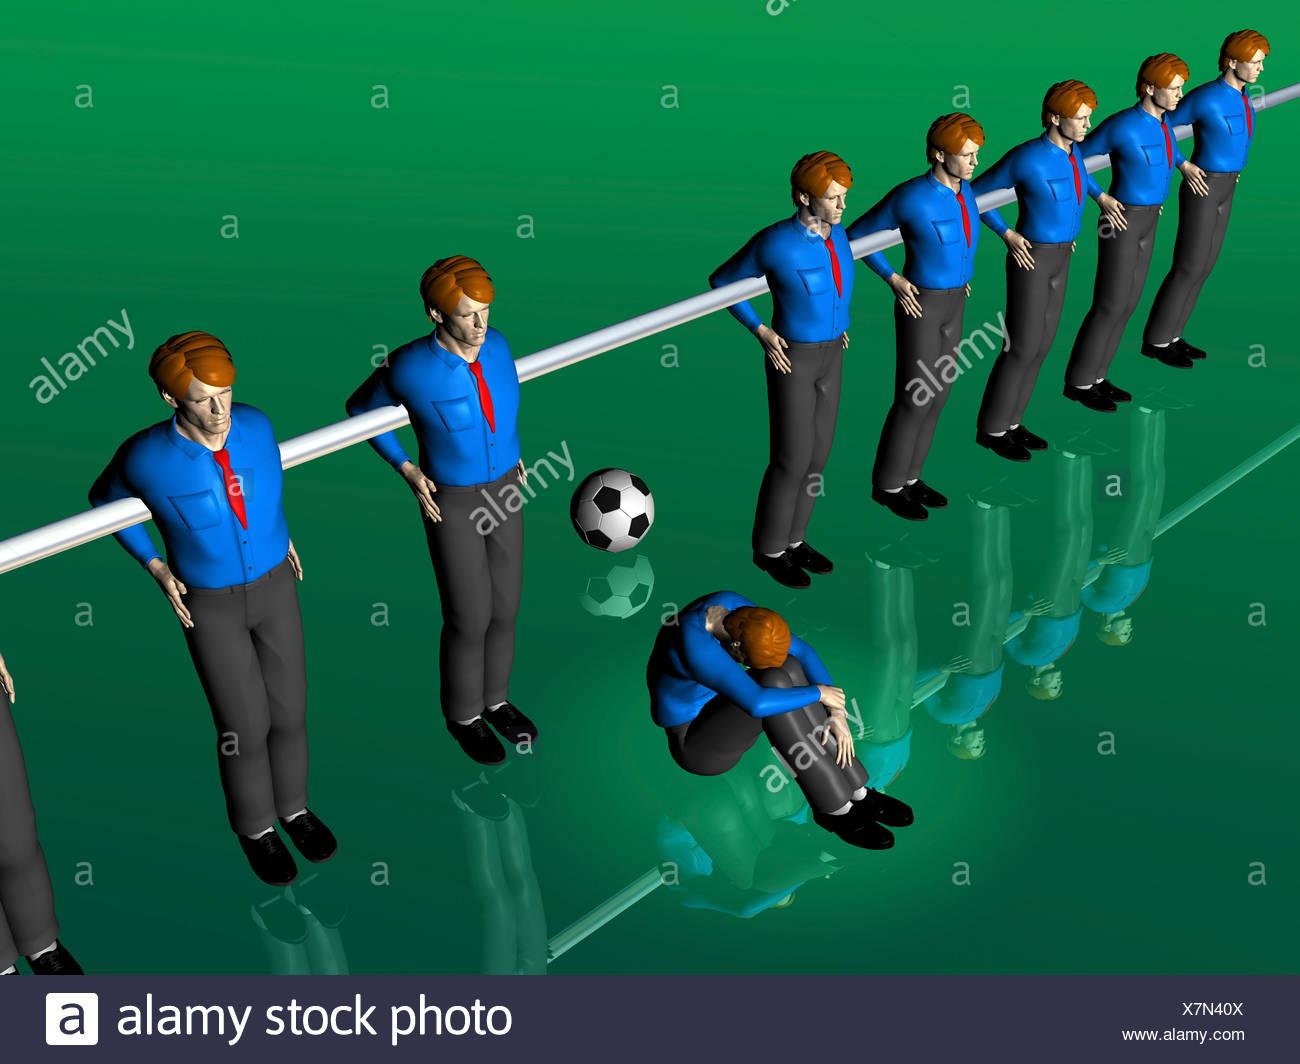 Table soccer figures, one sitting on the ground, illustration, symbolic image - Stock Image